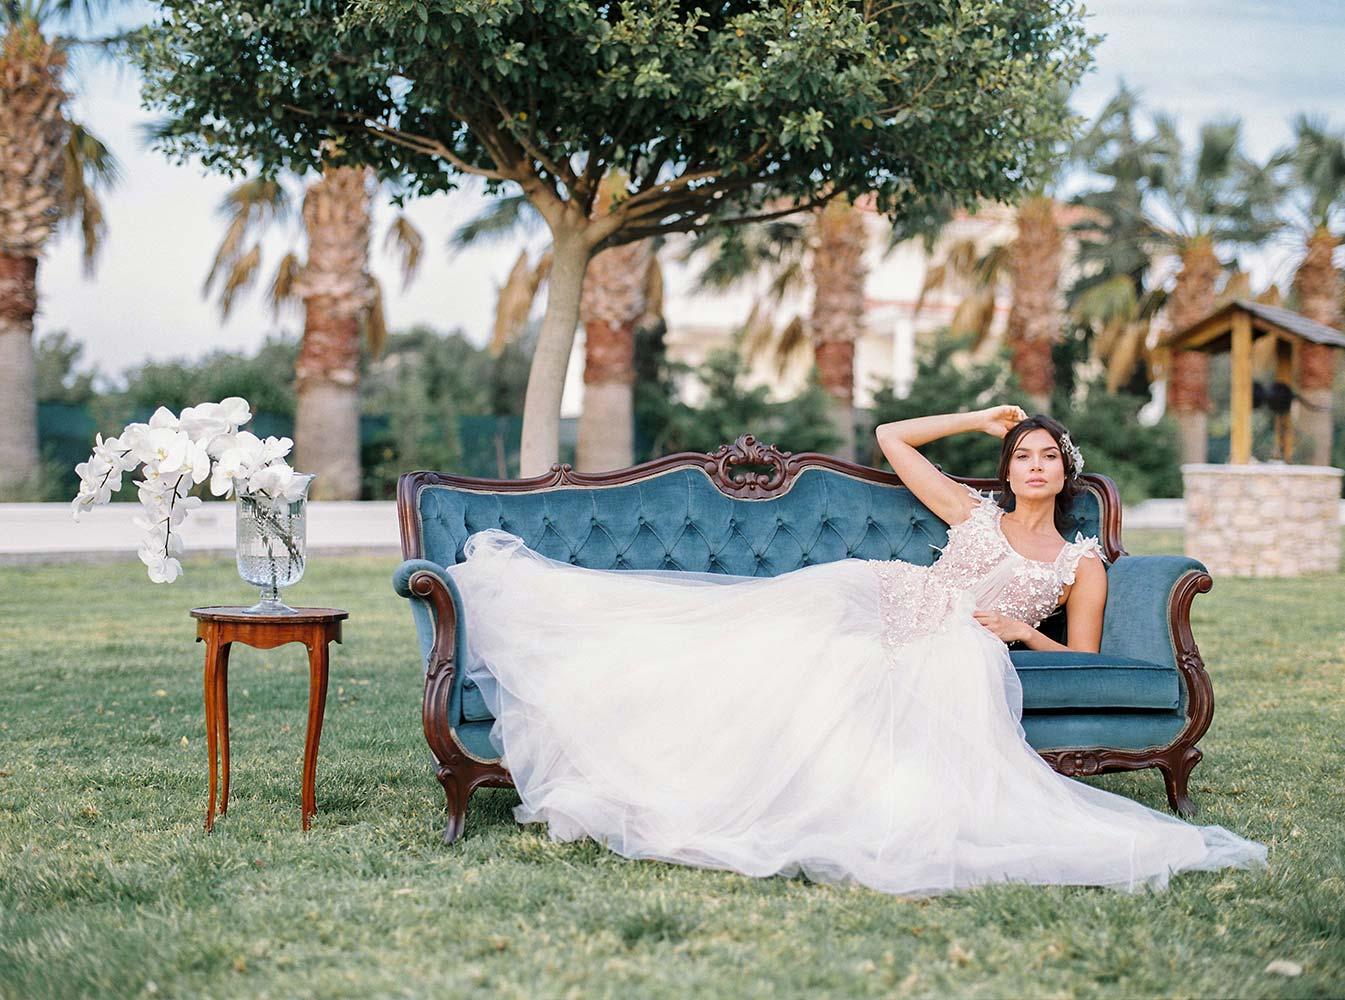 10_tomas_dolejsi_fine_art_destination_wedding_photographer